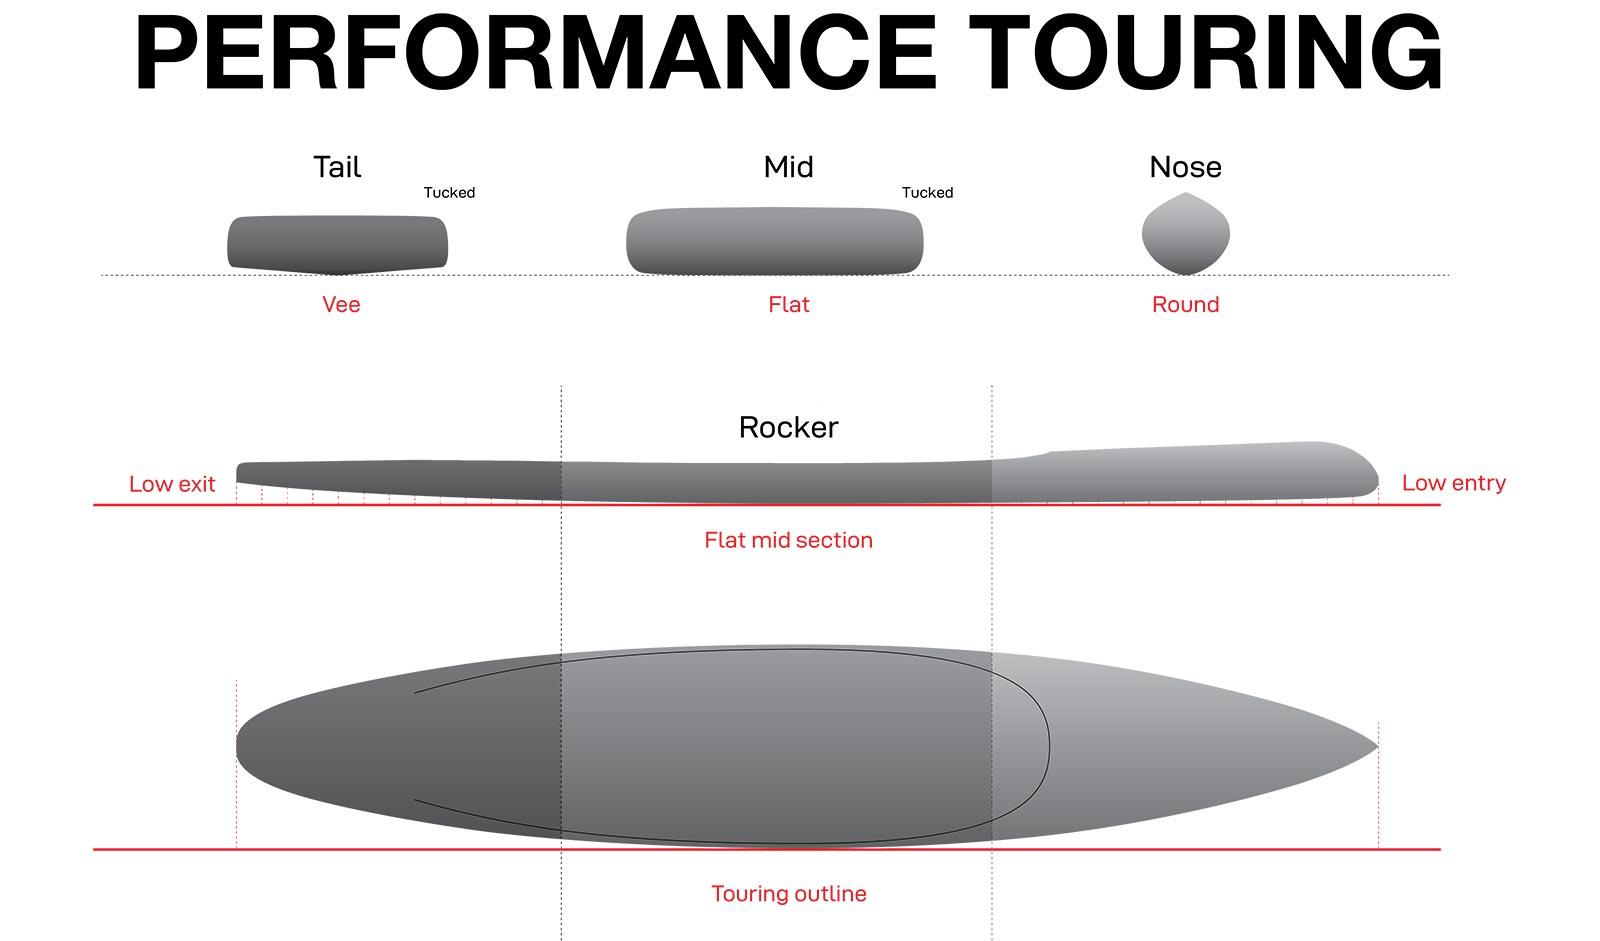 Performance Touring